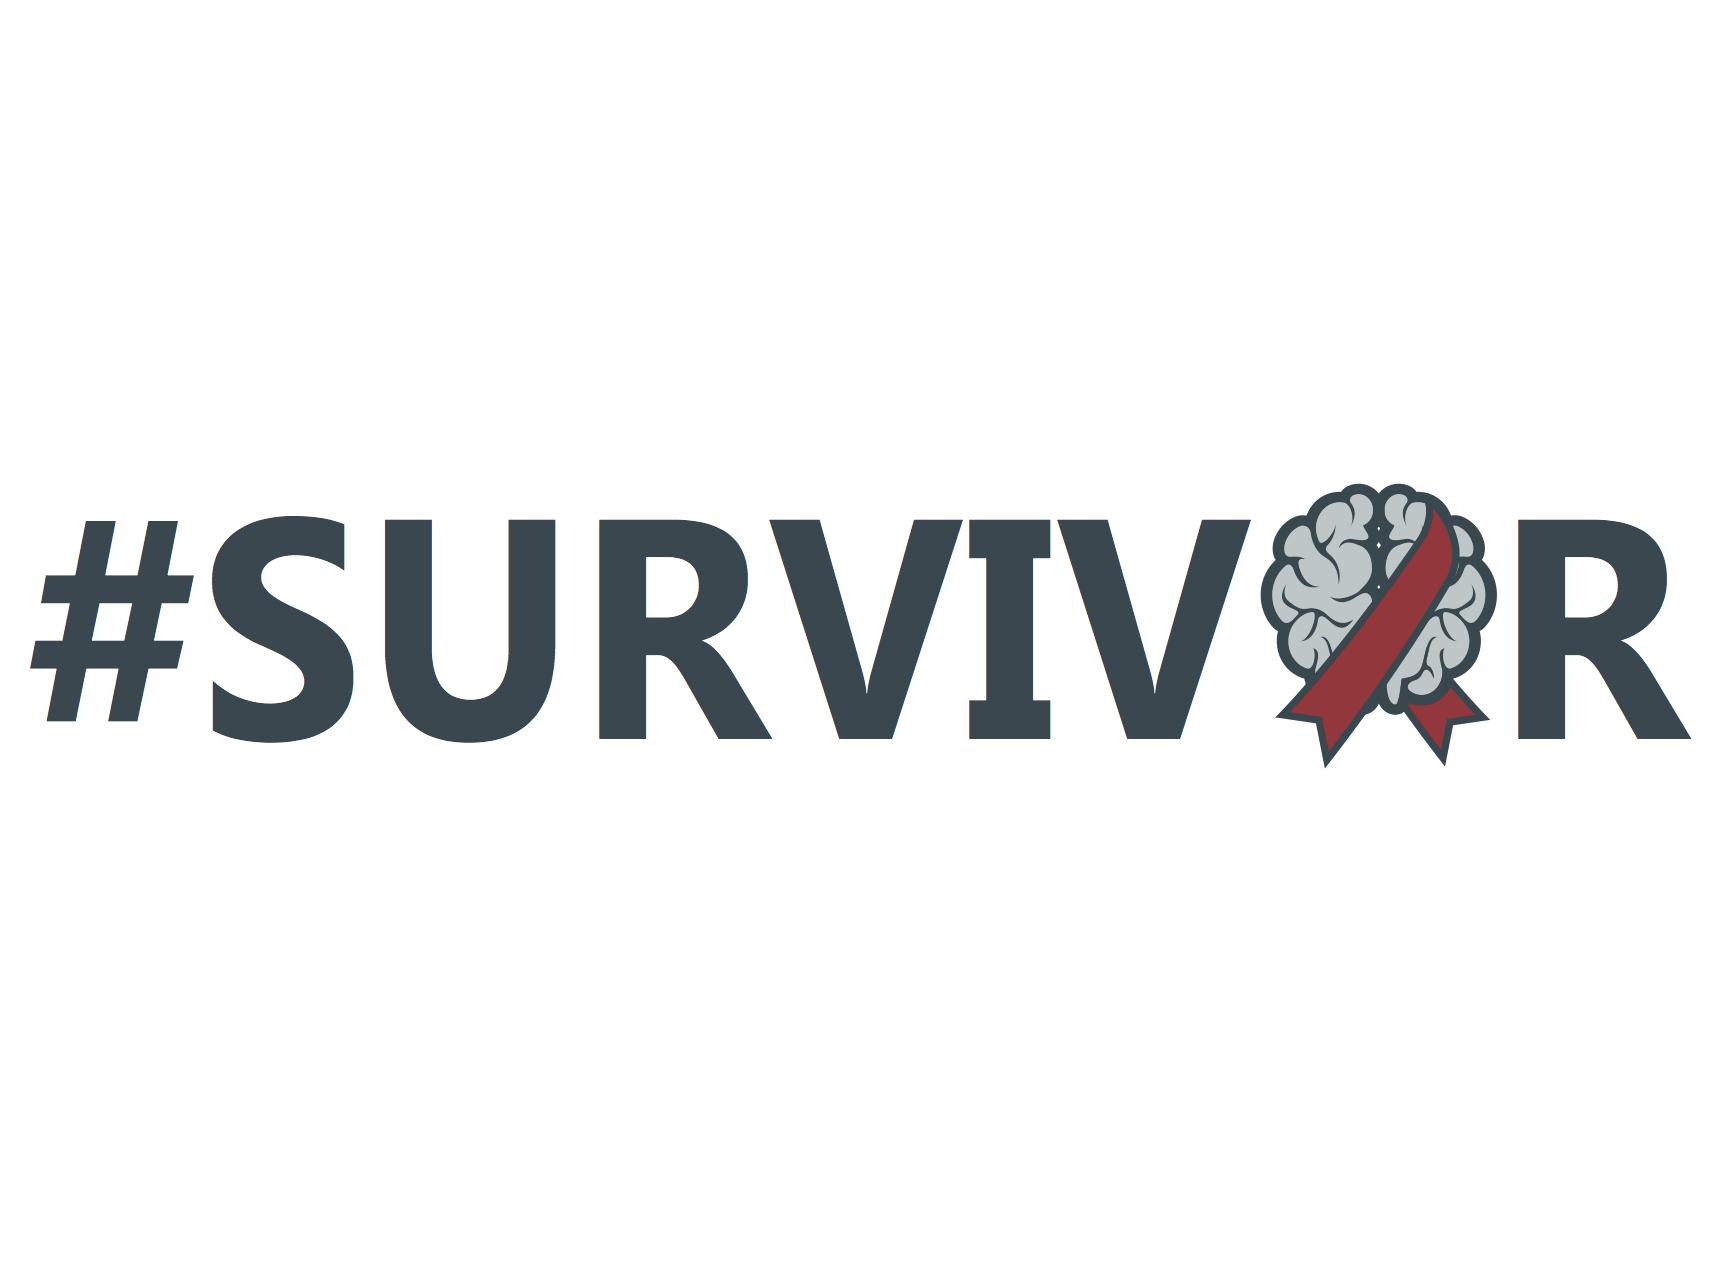 http://www.joeniekrofoundation.com/batter-up-for-brain-aneurysms/attachment/hashtag-survivor-2/